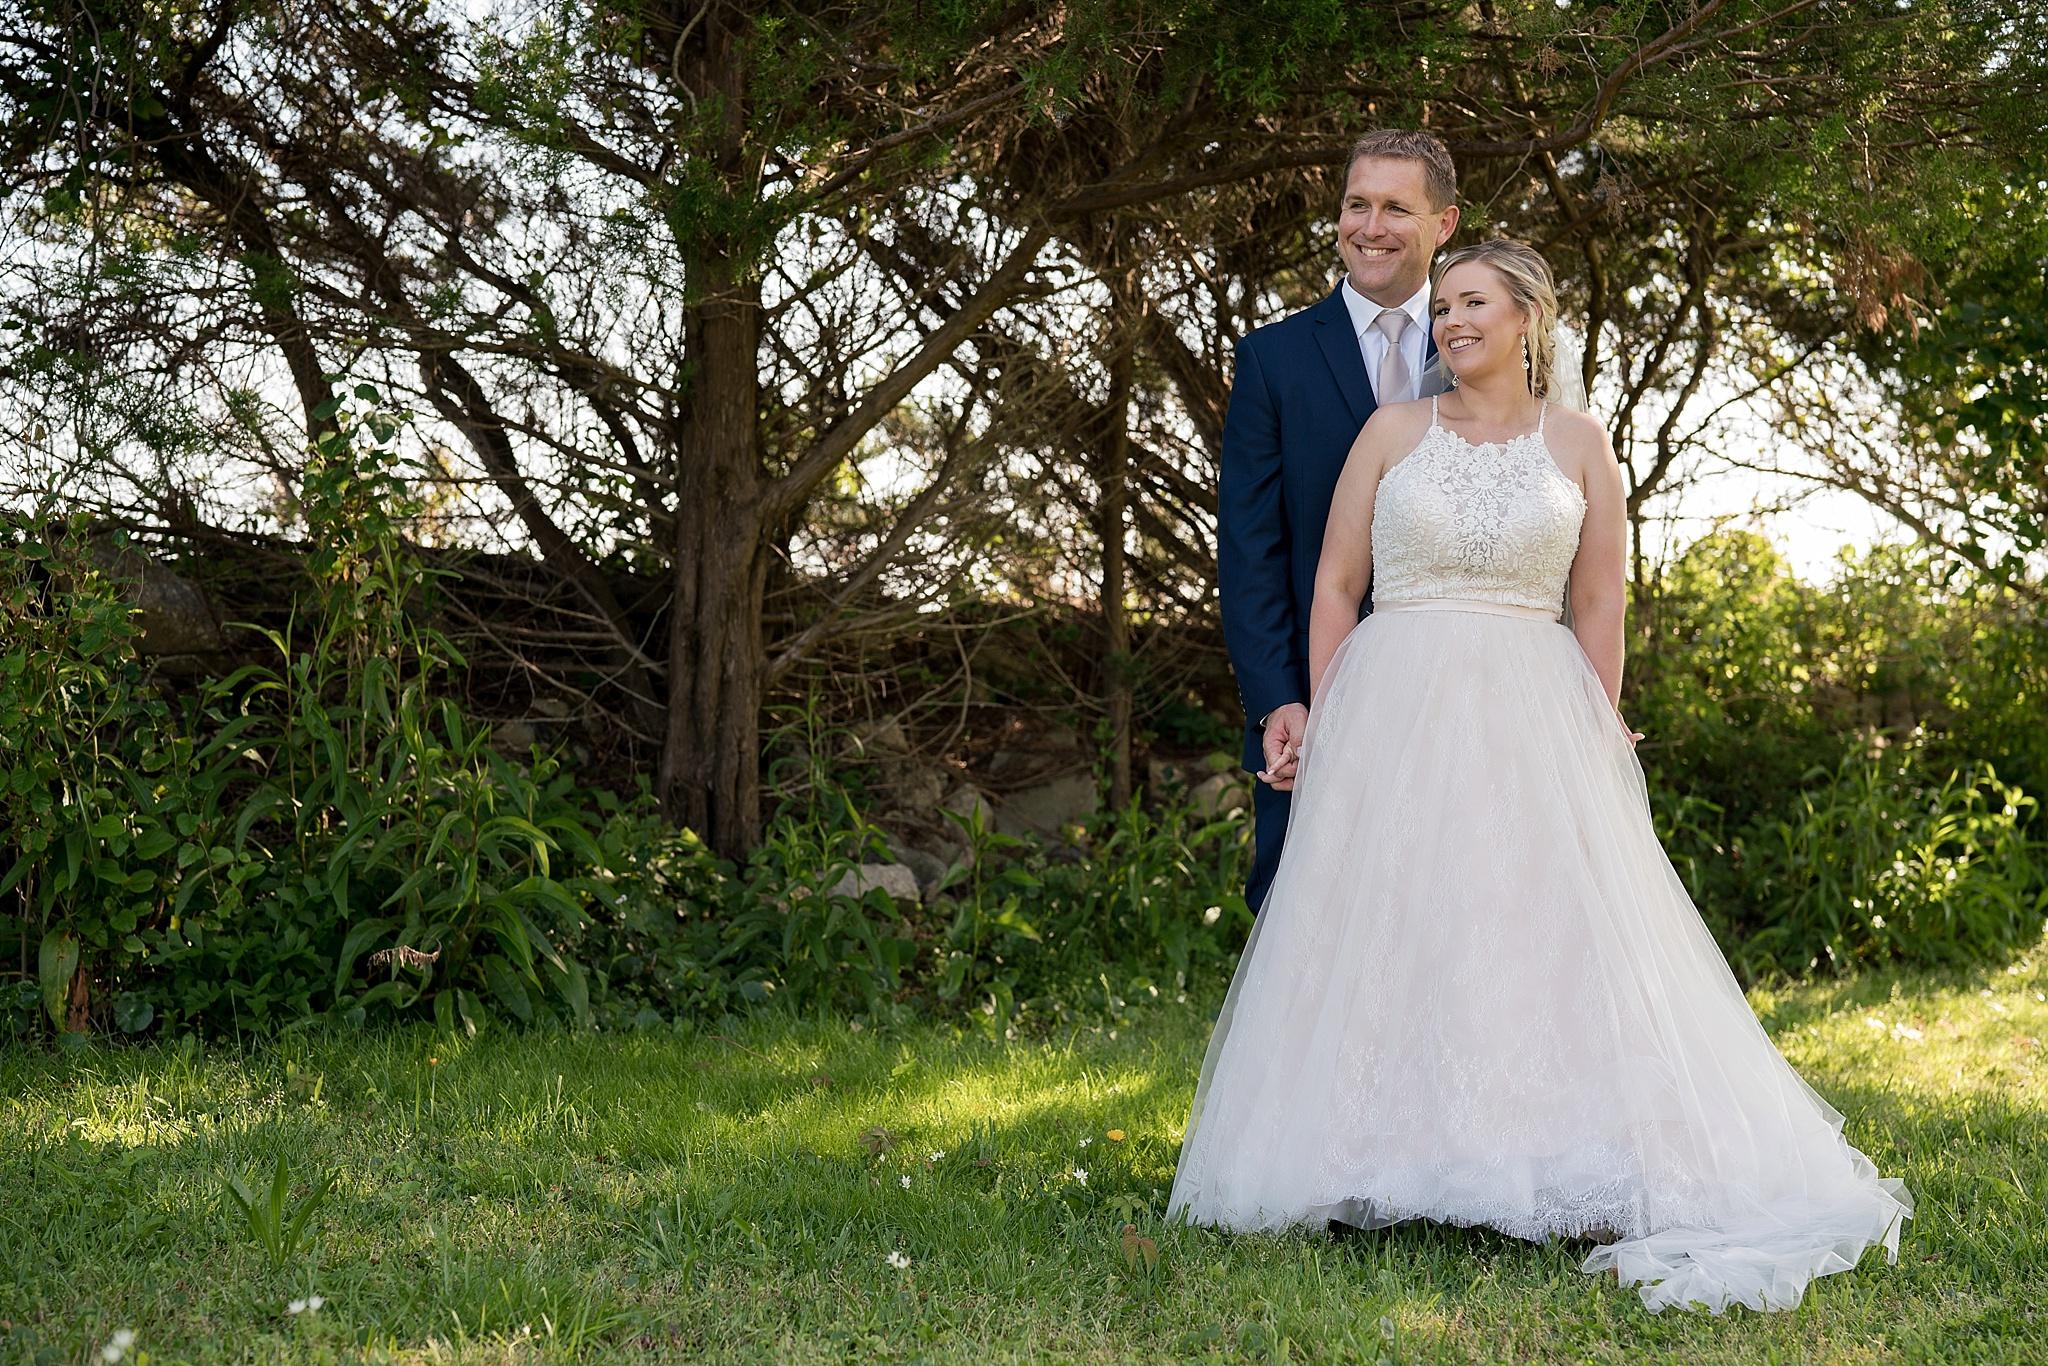 Crystal-Coast-Wedding-Photographer-032.jpg